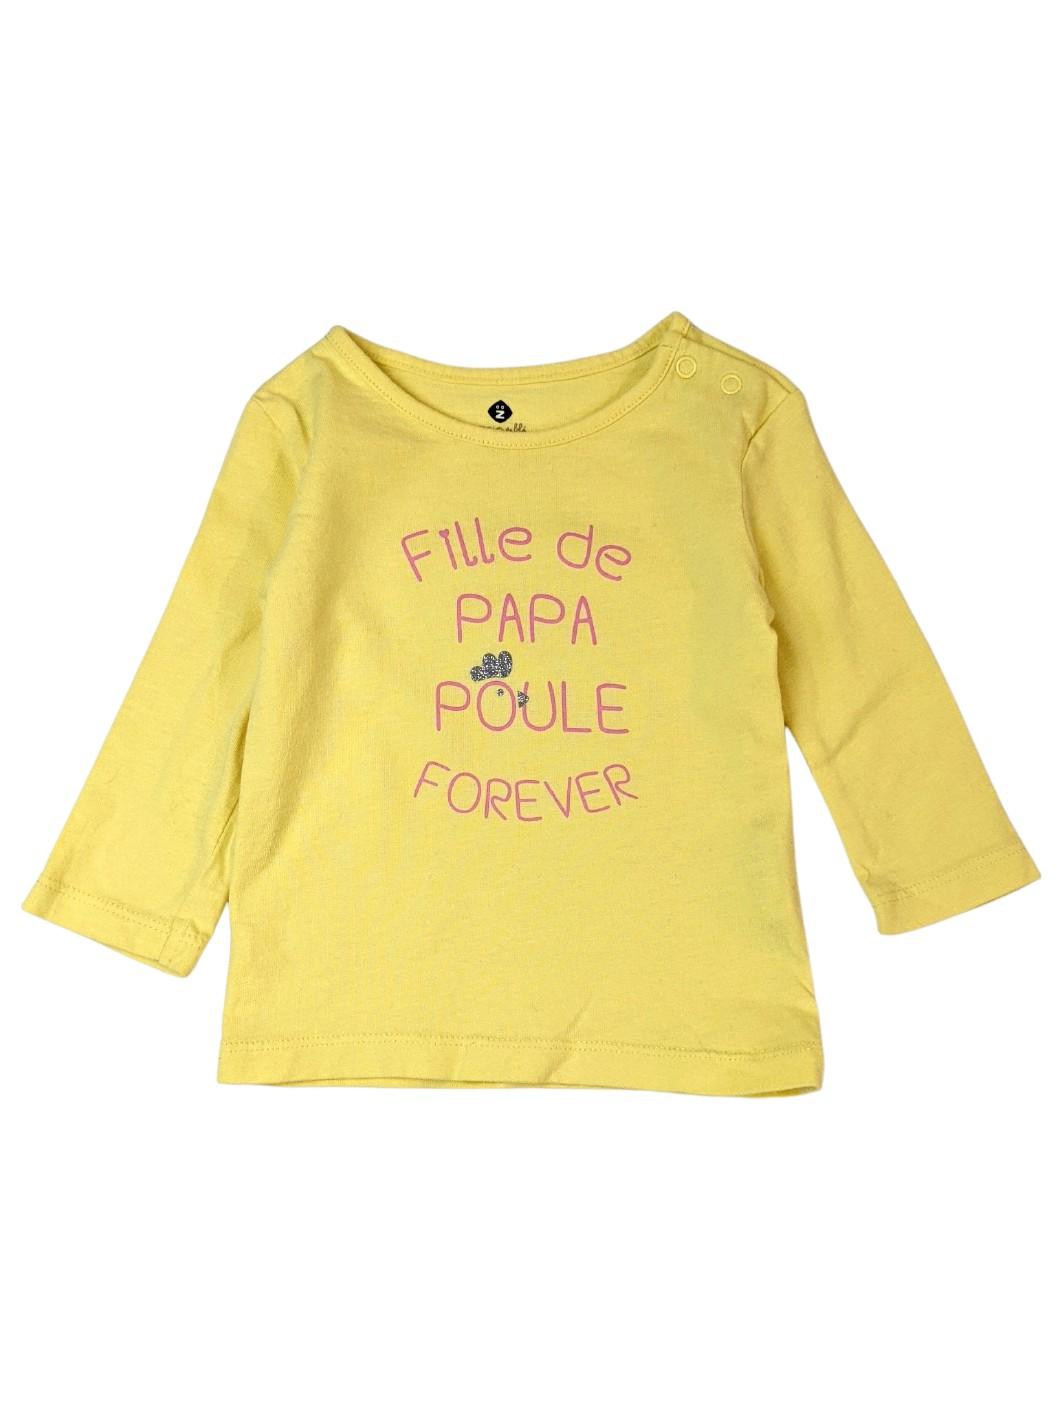 Tee-shirt poule 1